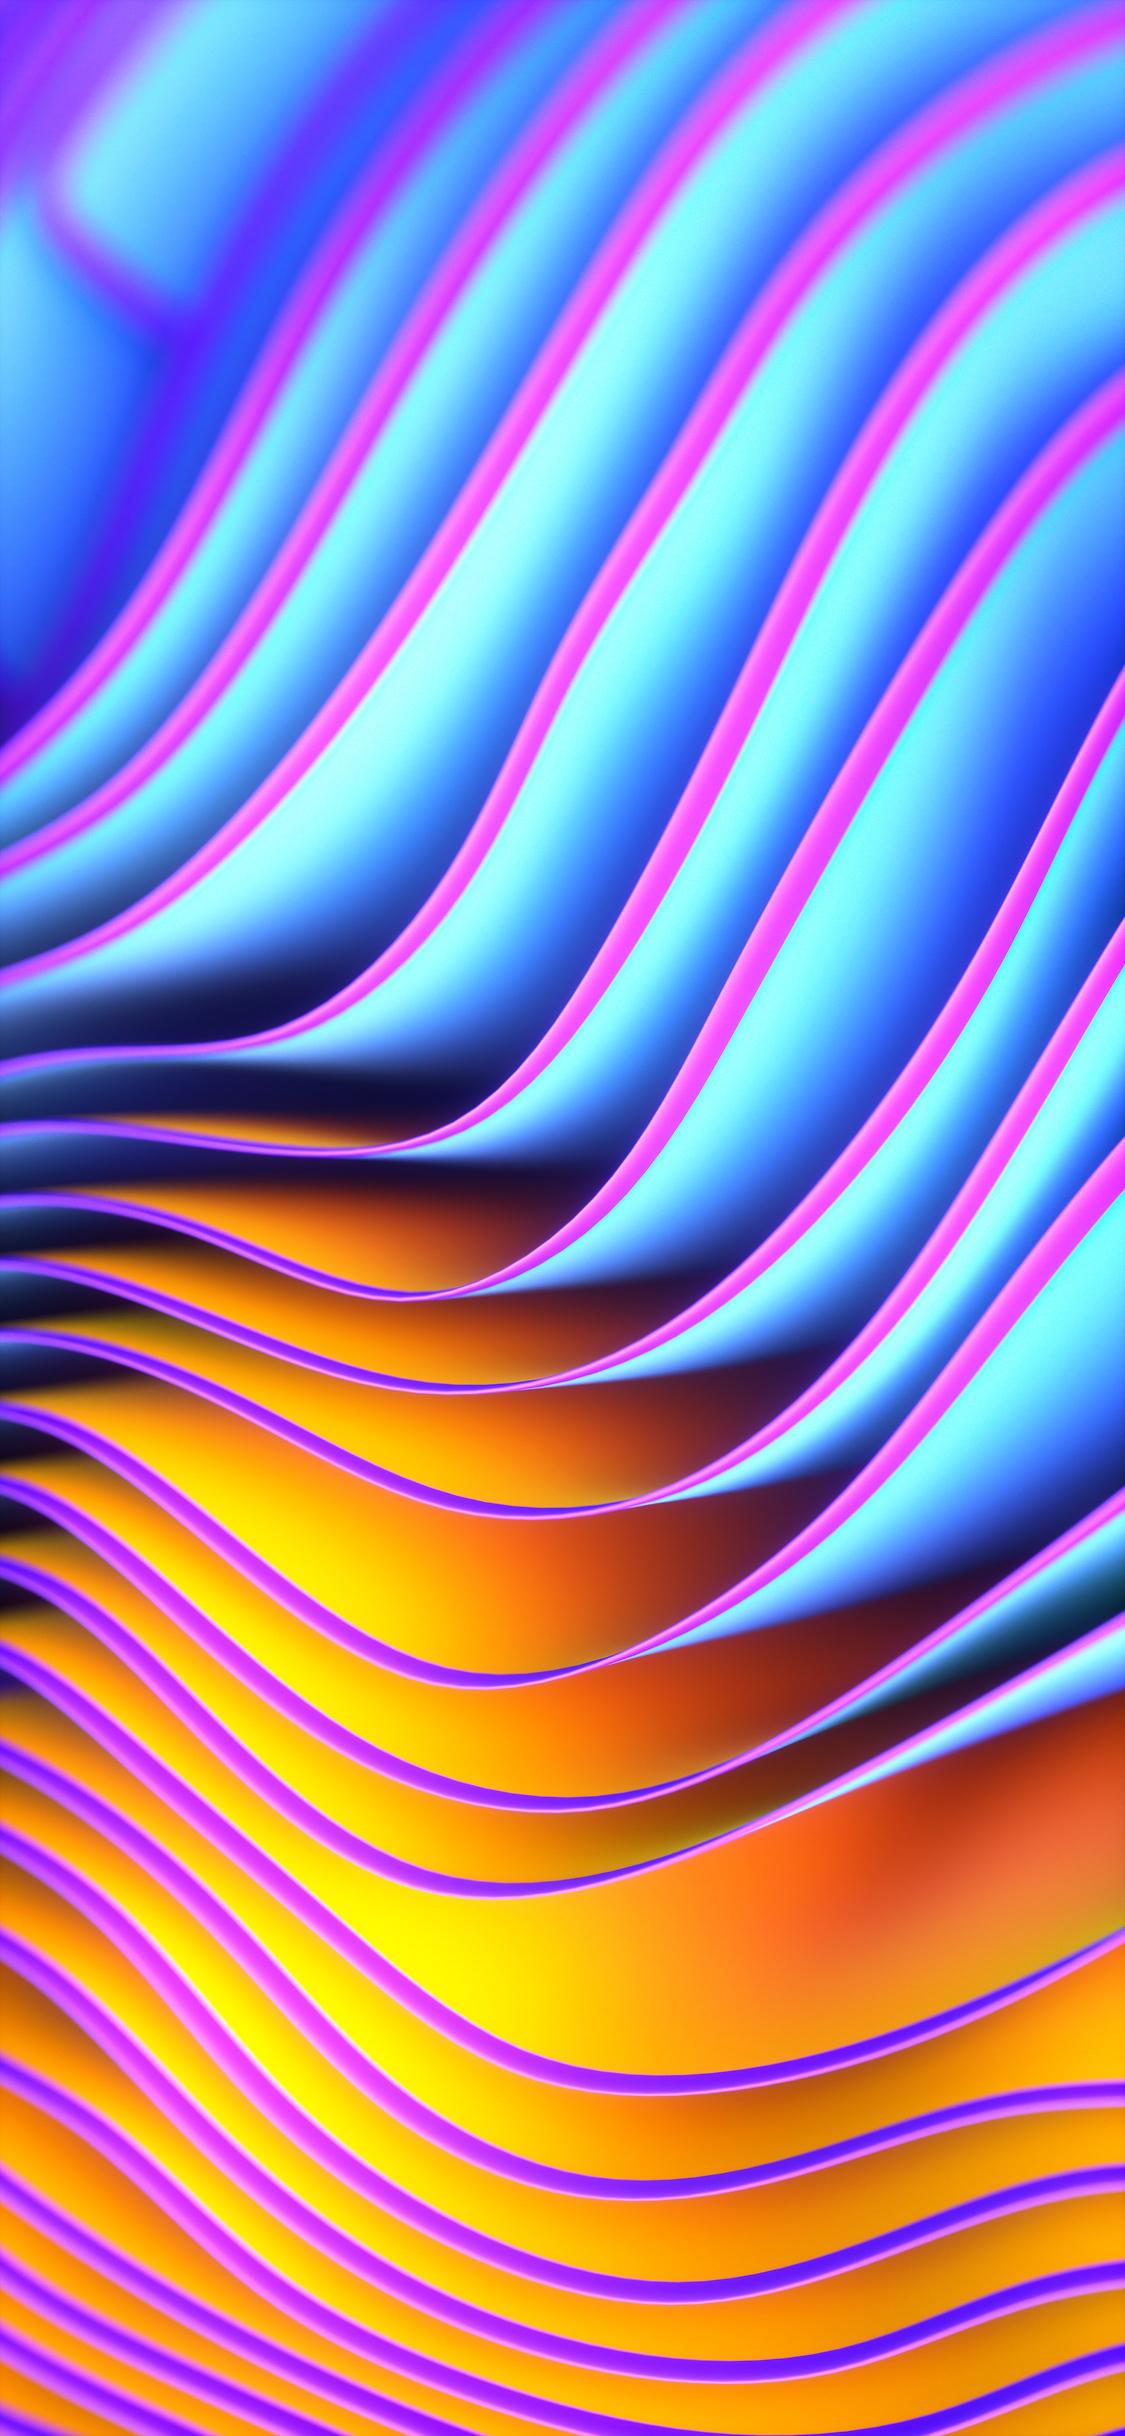 Twirl_02_02_02-1